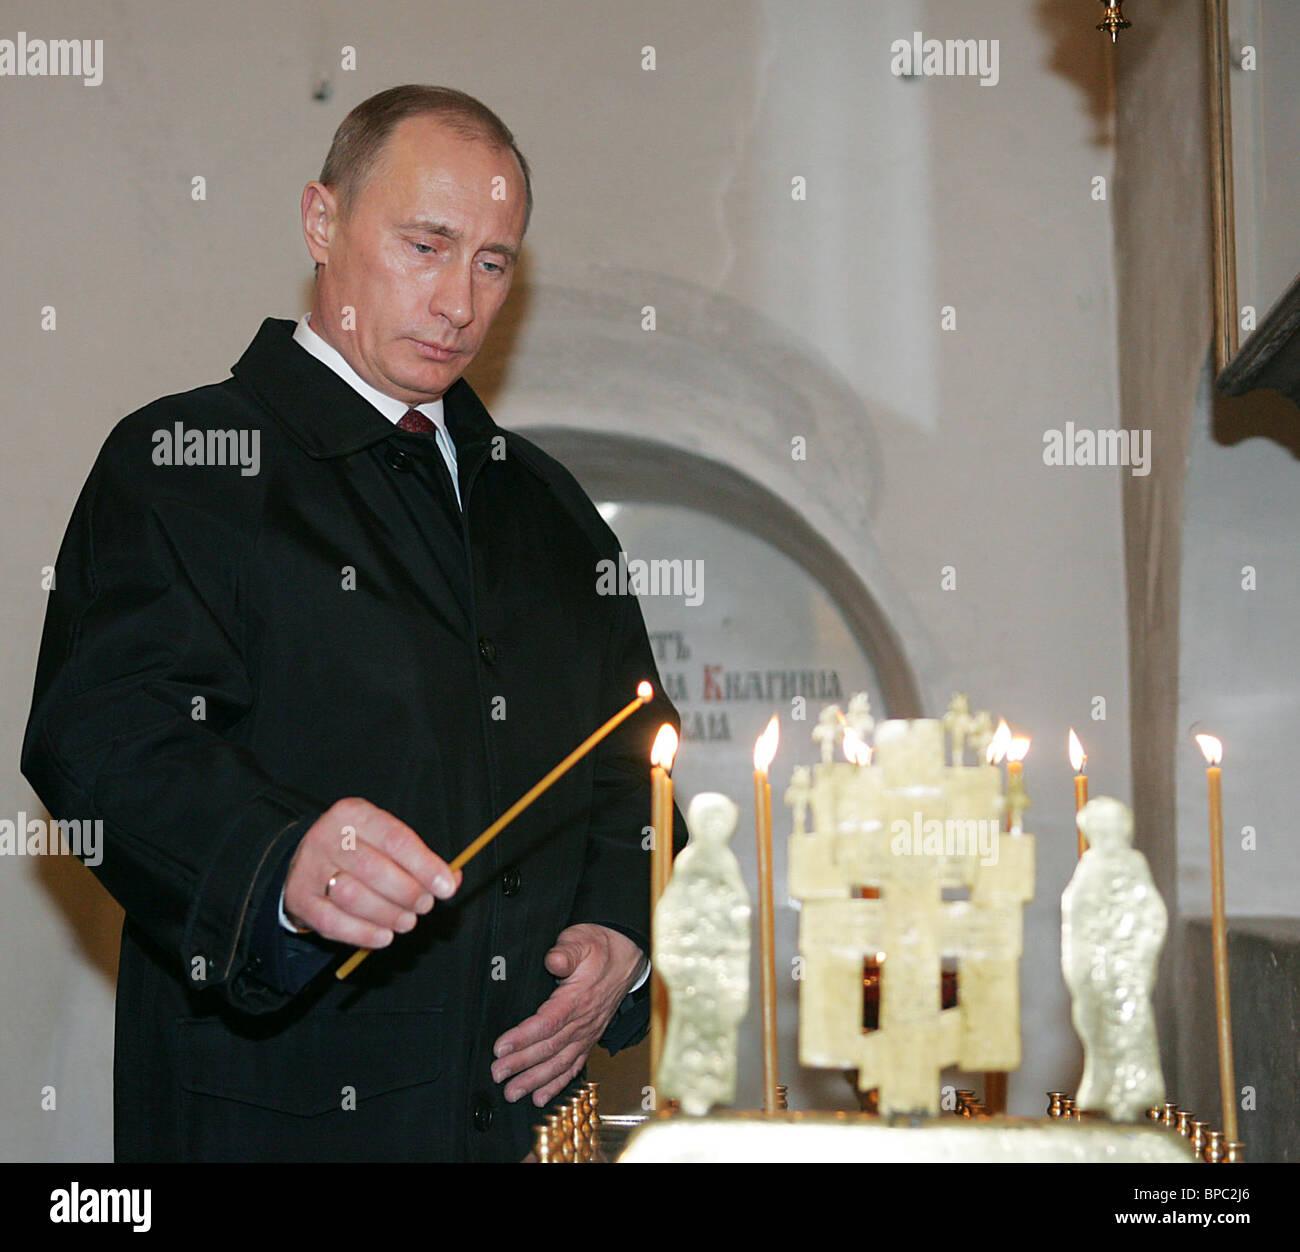 Russian President Vladimir Putin visits Nizhni Novgorod - Stock Image